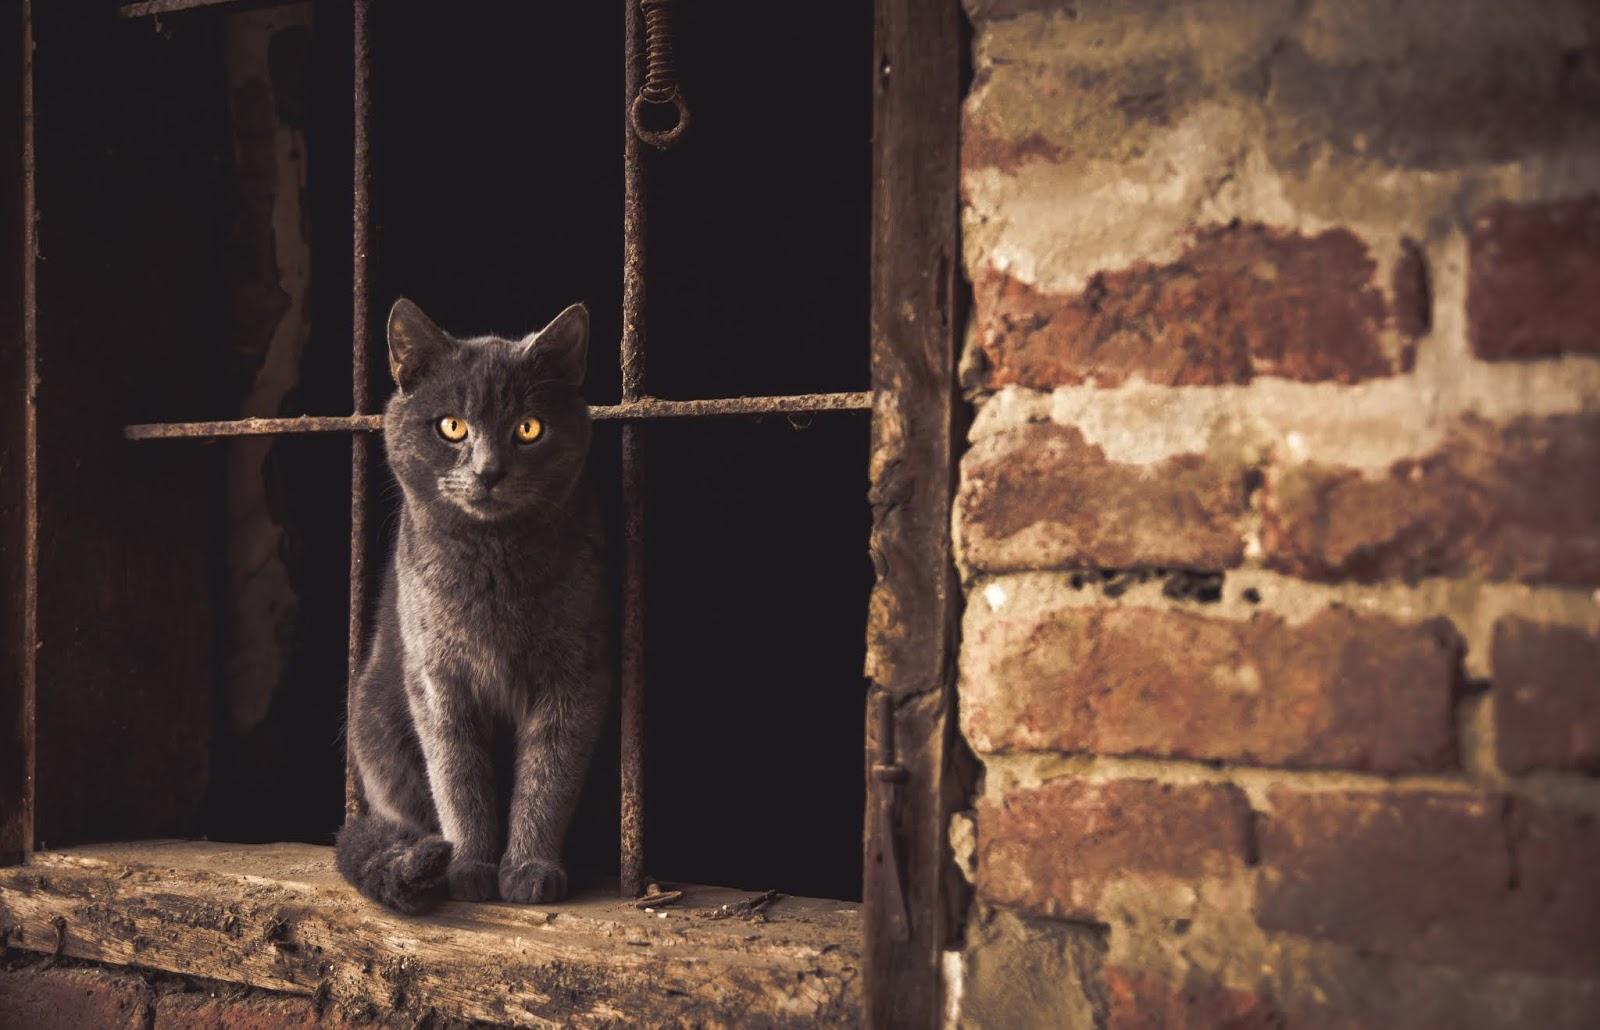 Russian cat sitting on window jamb,cat images